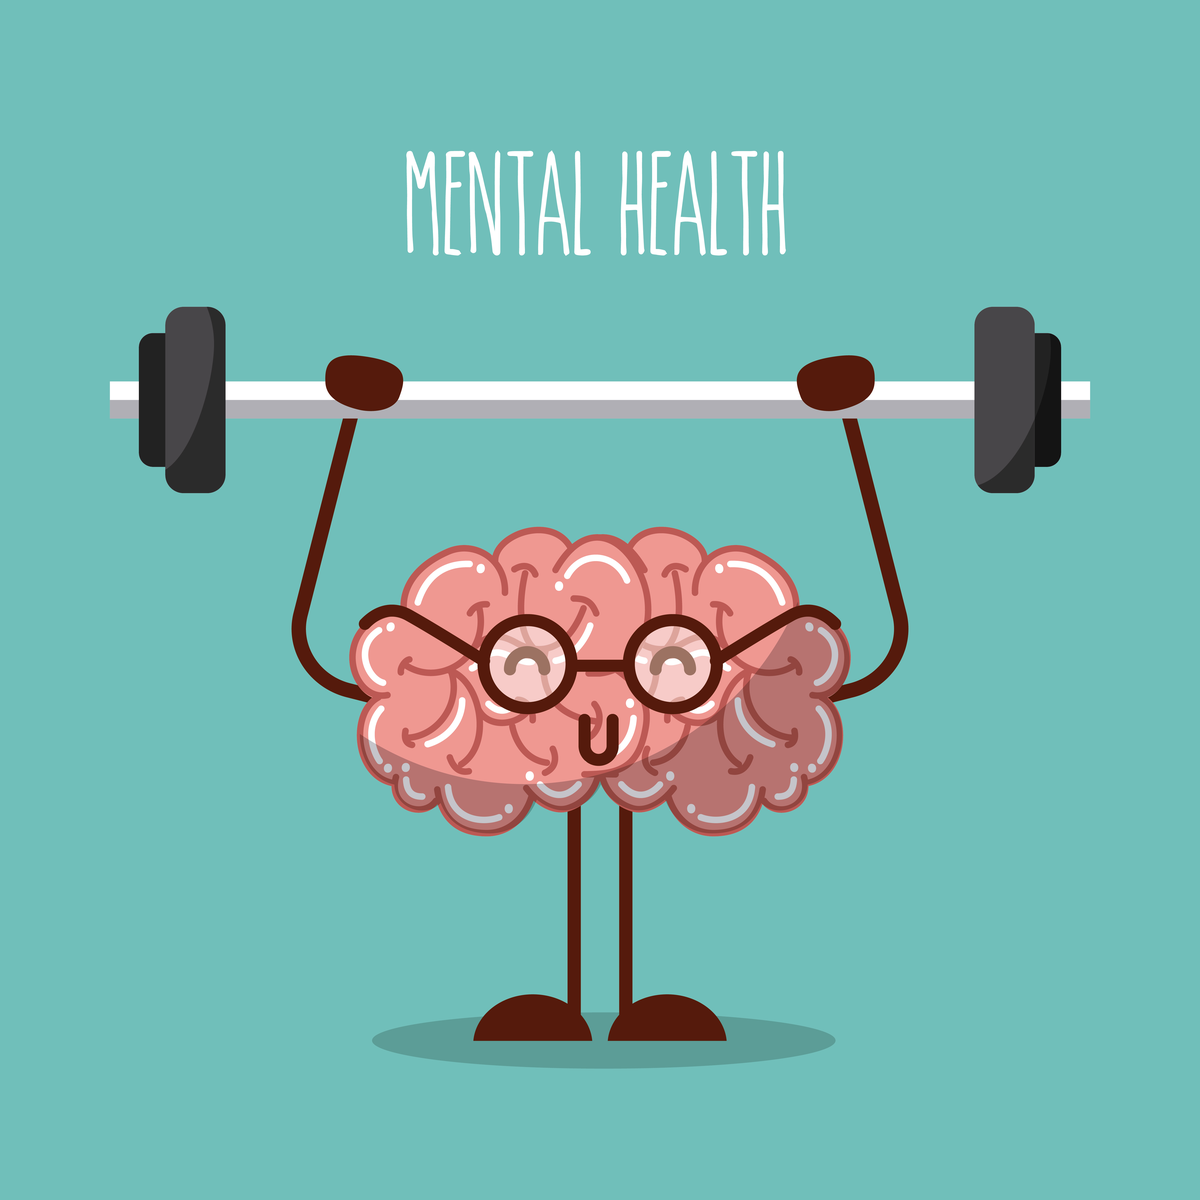 Cartoon brain illustration lifting weights